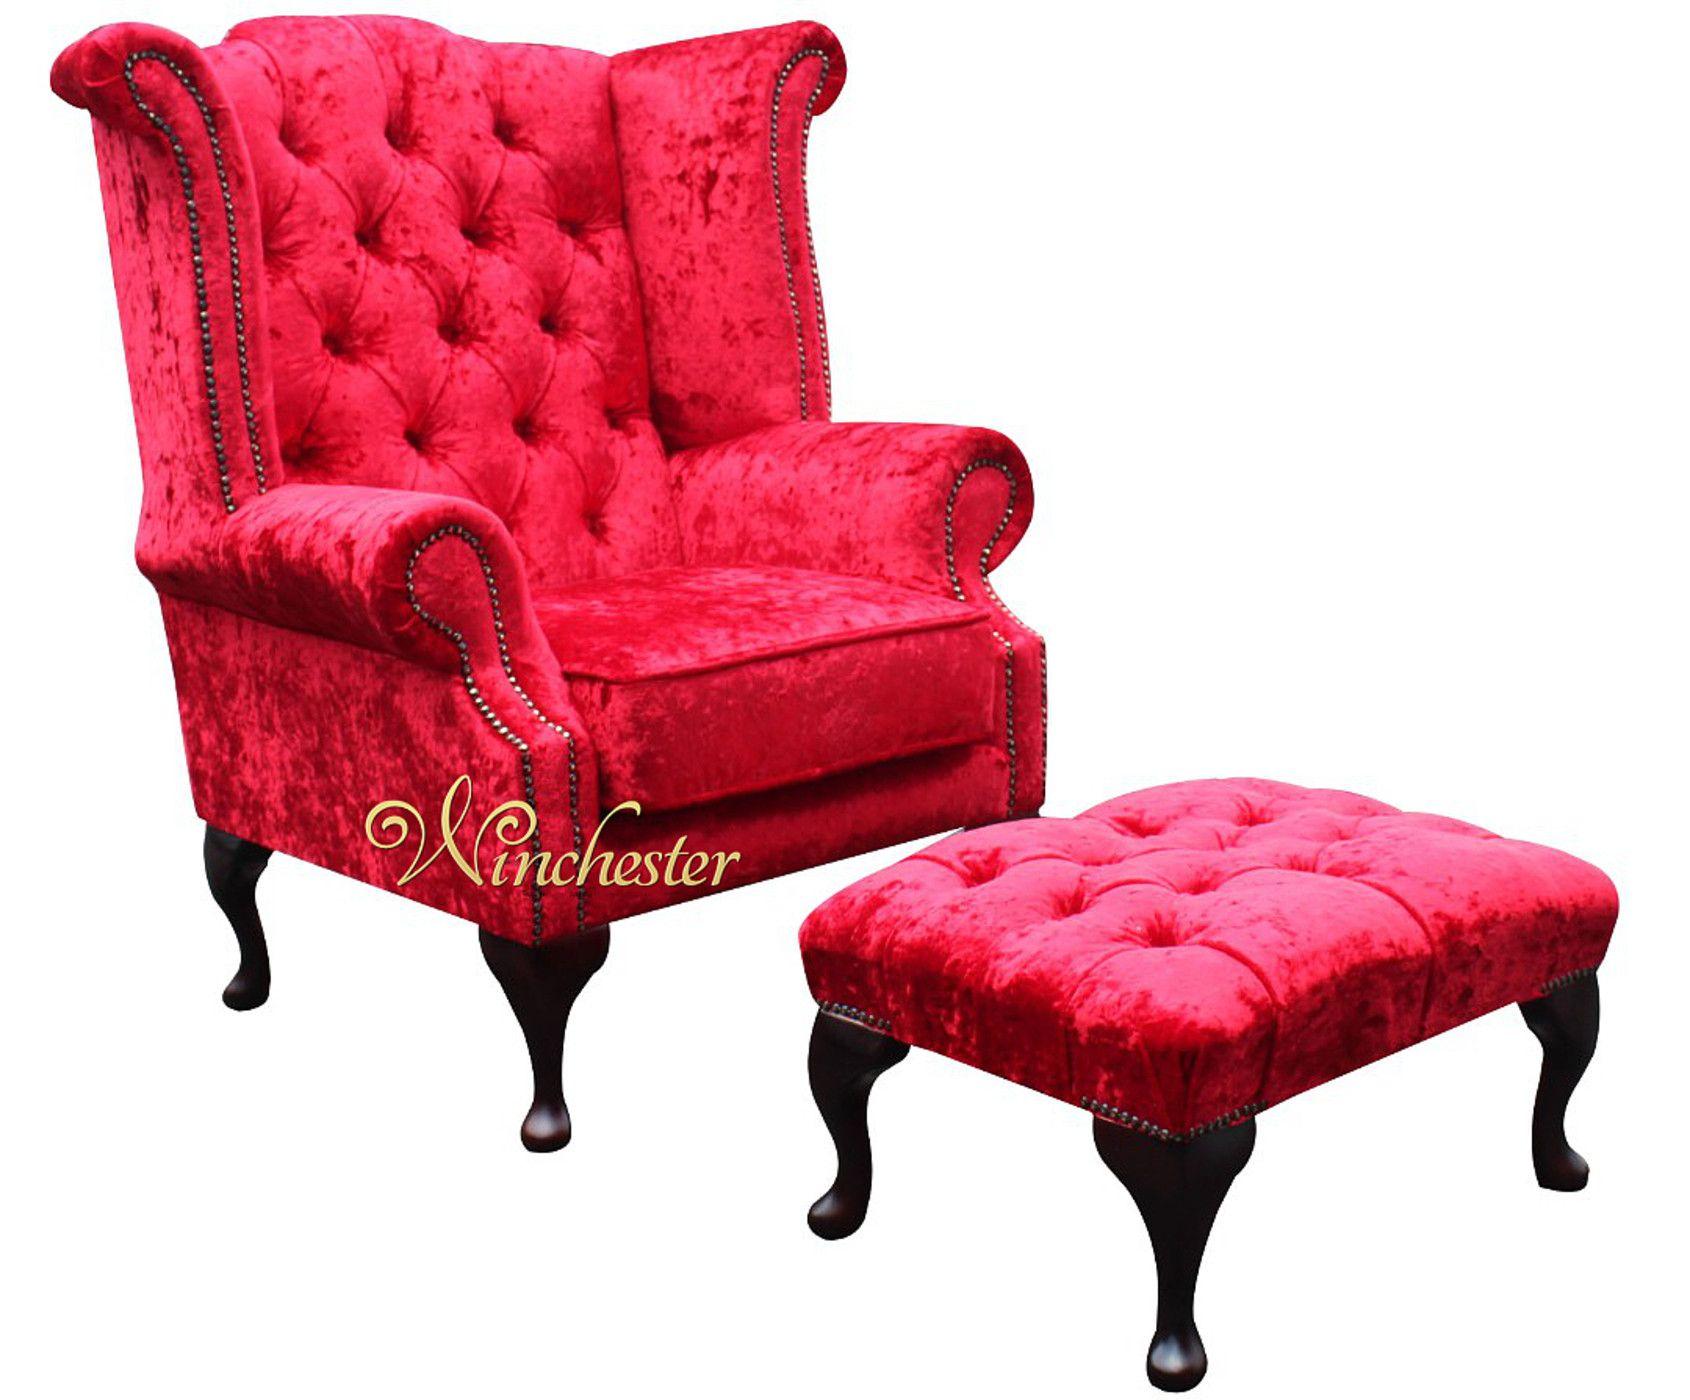 Chesterfield Leder Sofa Zum Verkauf Chesterfield Sofa ...